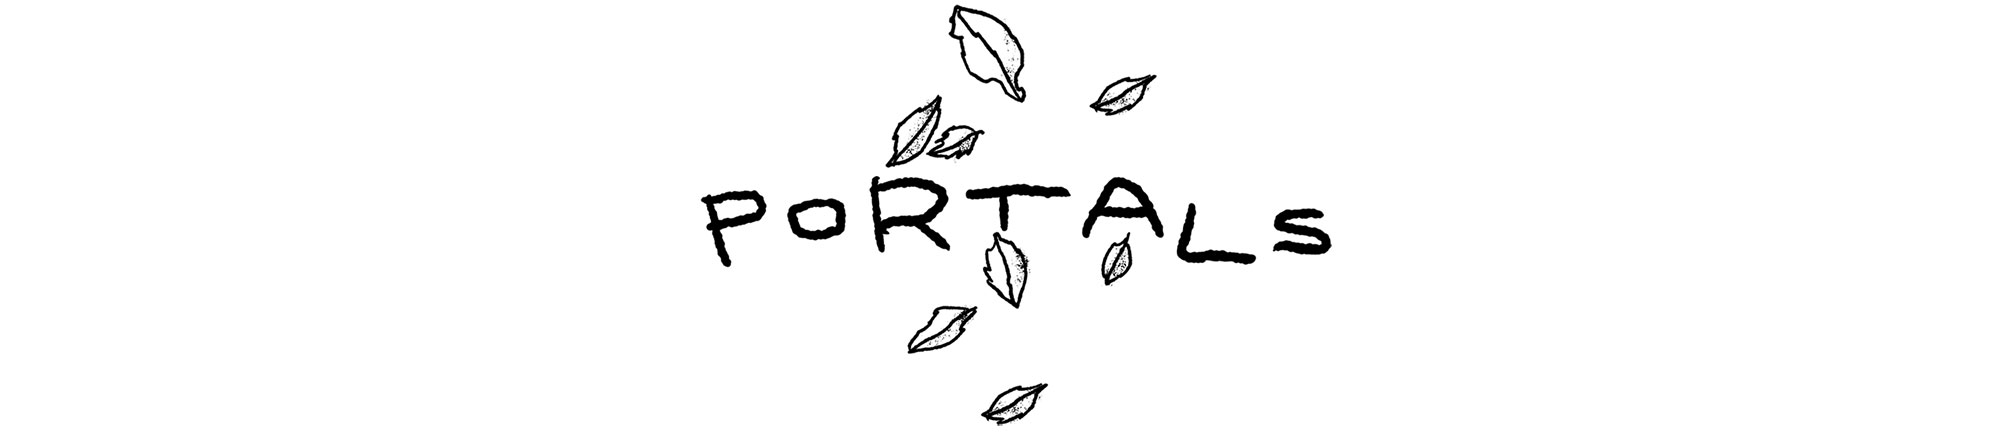 Portals_intro_image.jpg